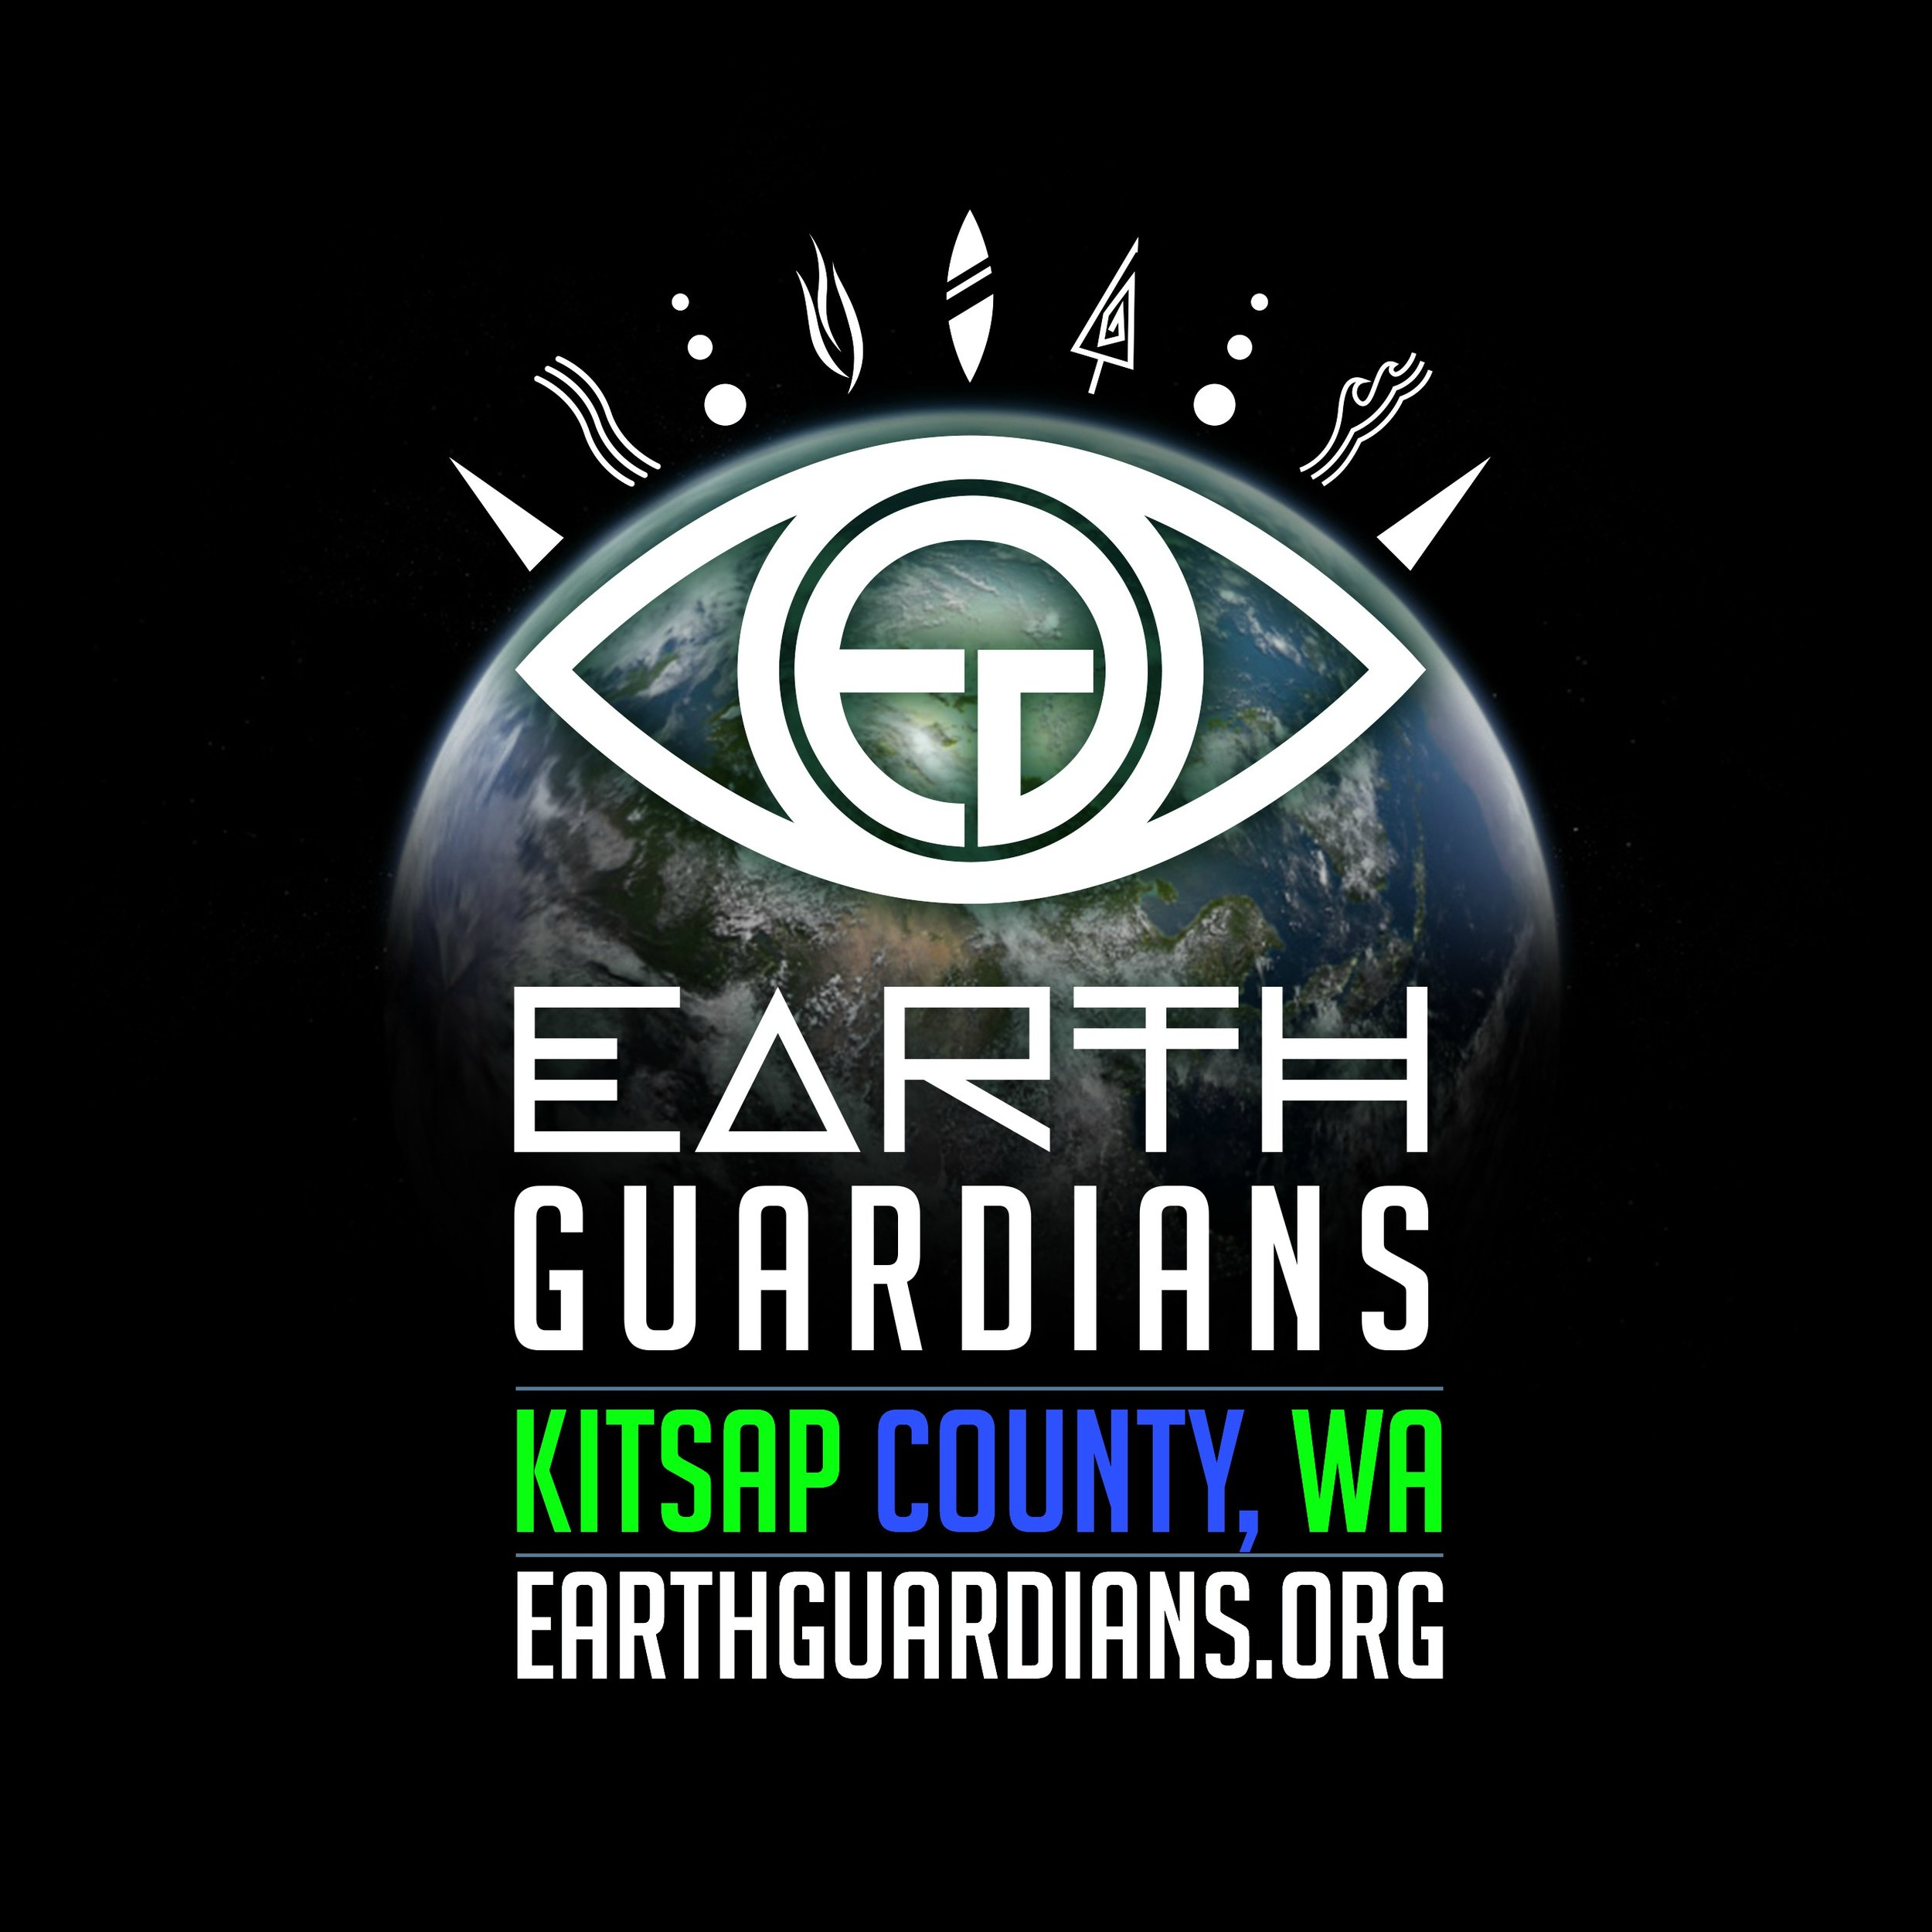 EG_crew logo KITSAP COUNTY WA.jpg